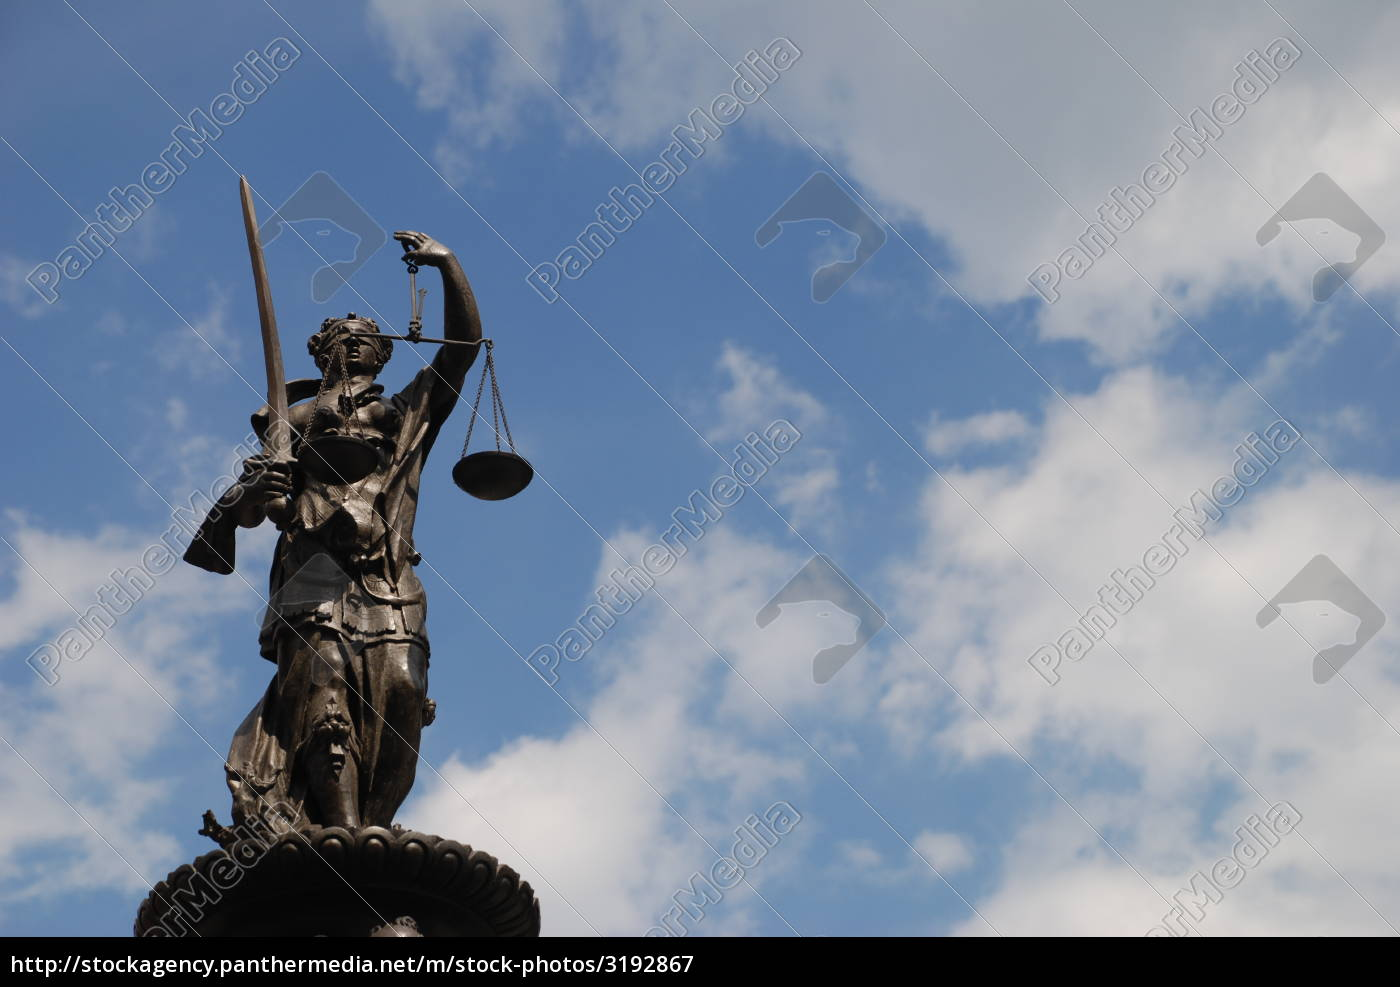 justice, justice, justice, court - 3192867